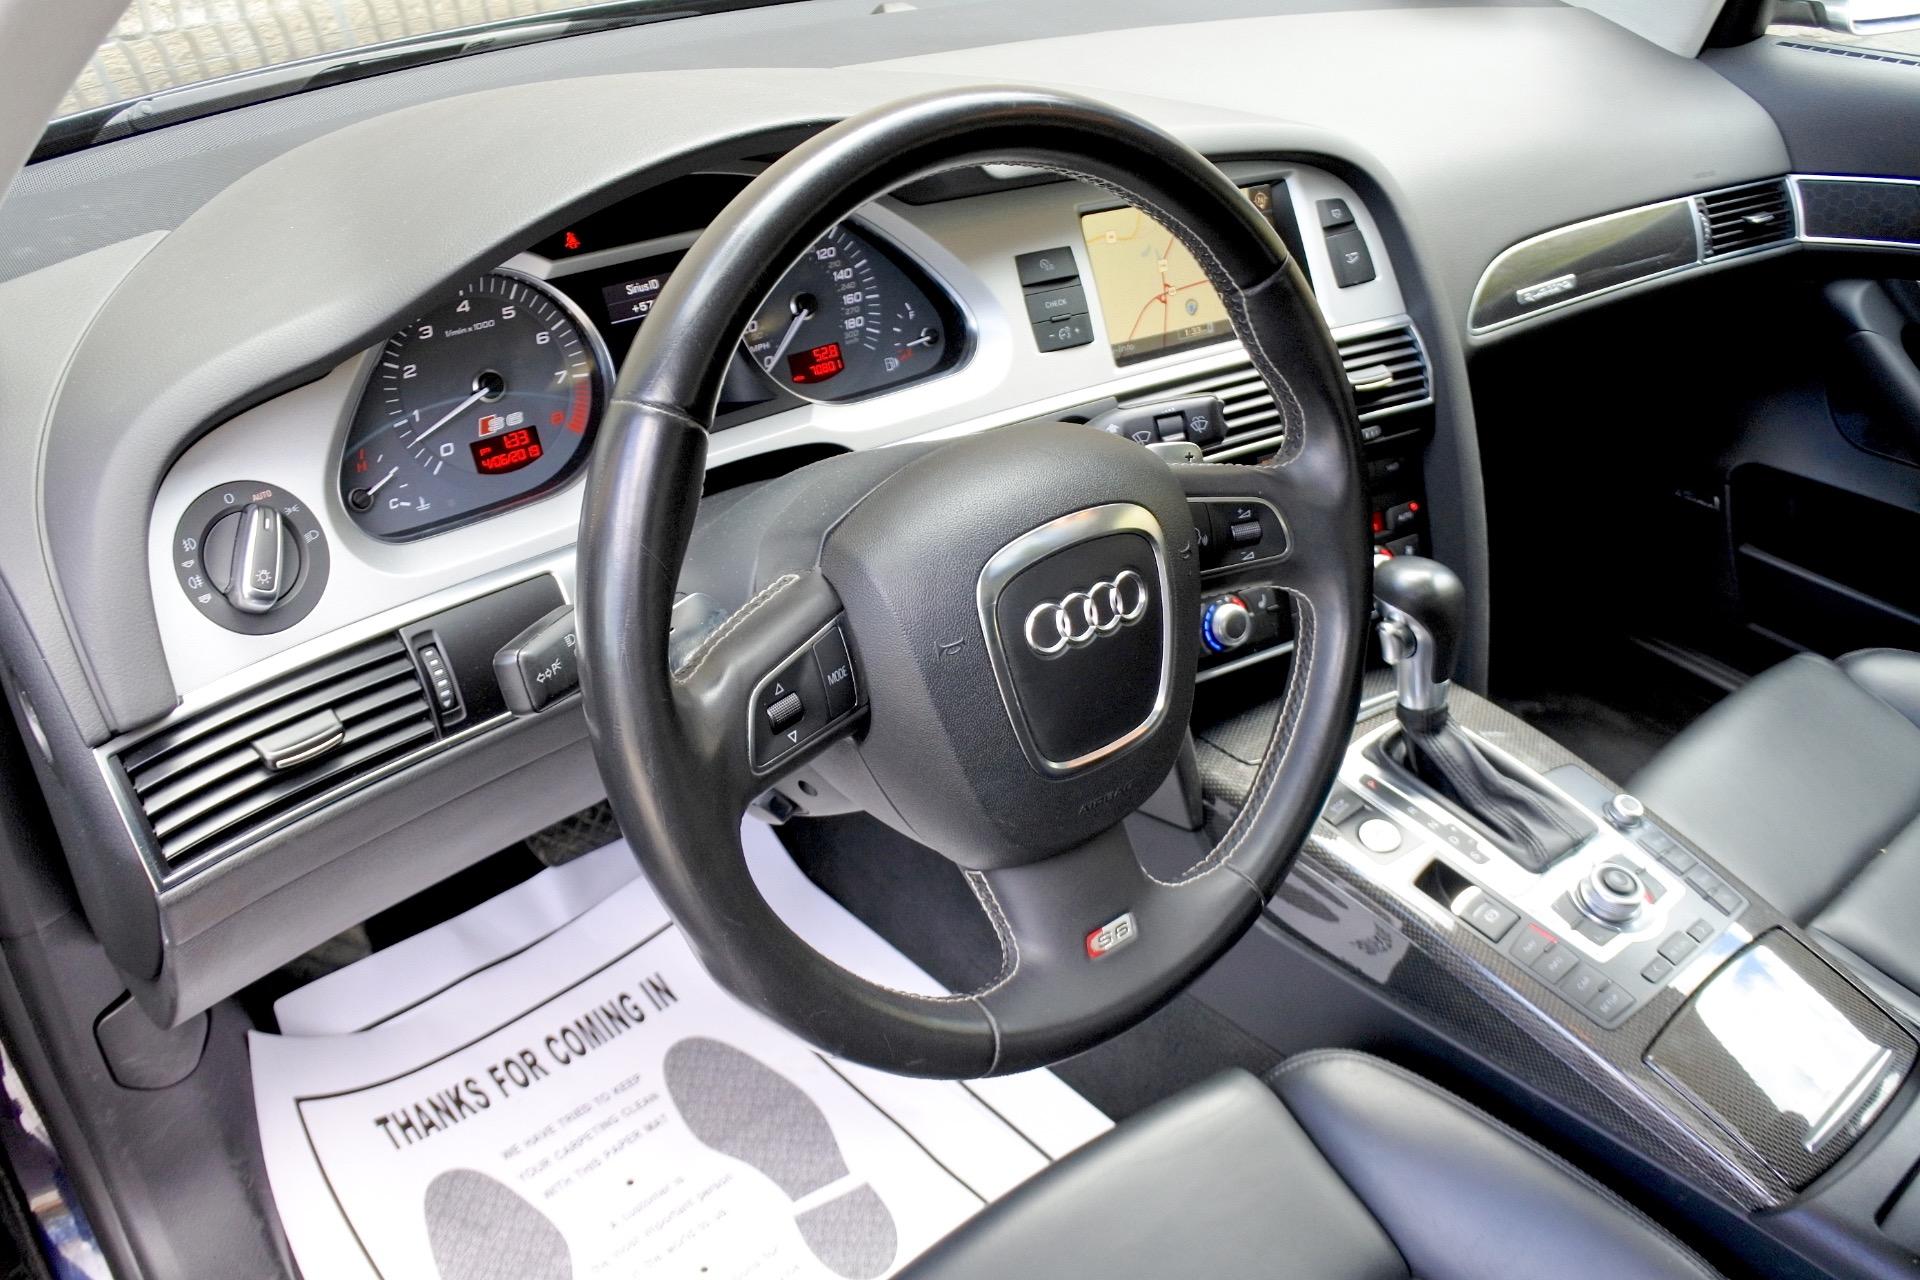 Used 2011 Audi S6 5.2 Prestige Quattro Used 2011 Audi S6 5.2 Prestige Quattro for sale  at Metro West Motorcars LLC in Shrewsbury MA 13